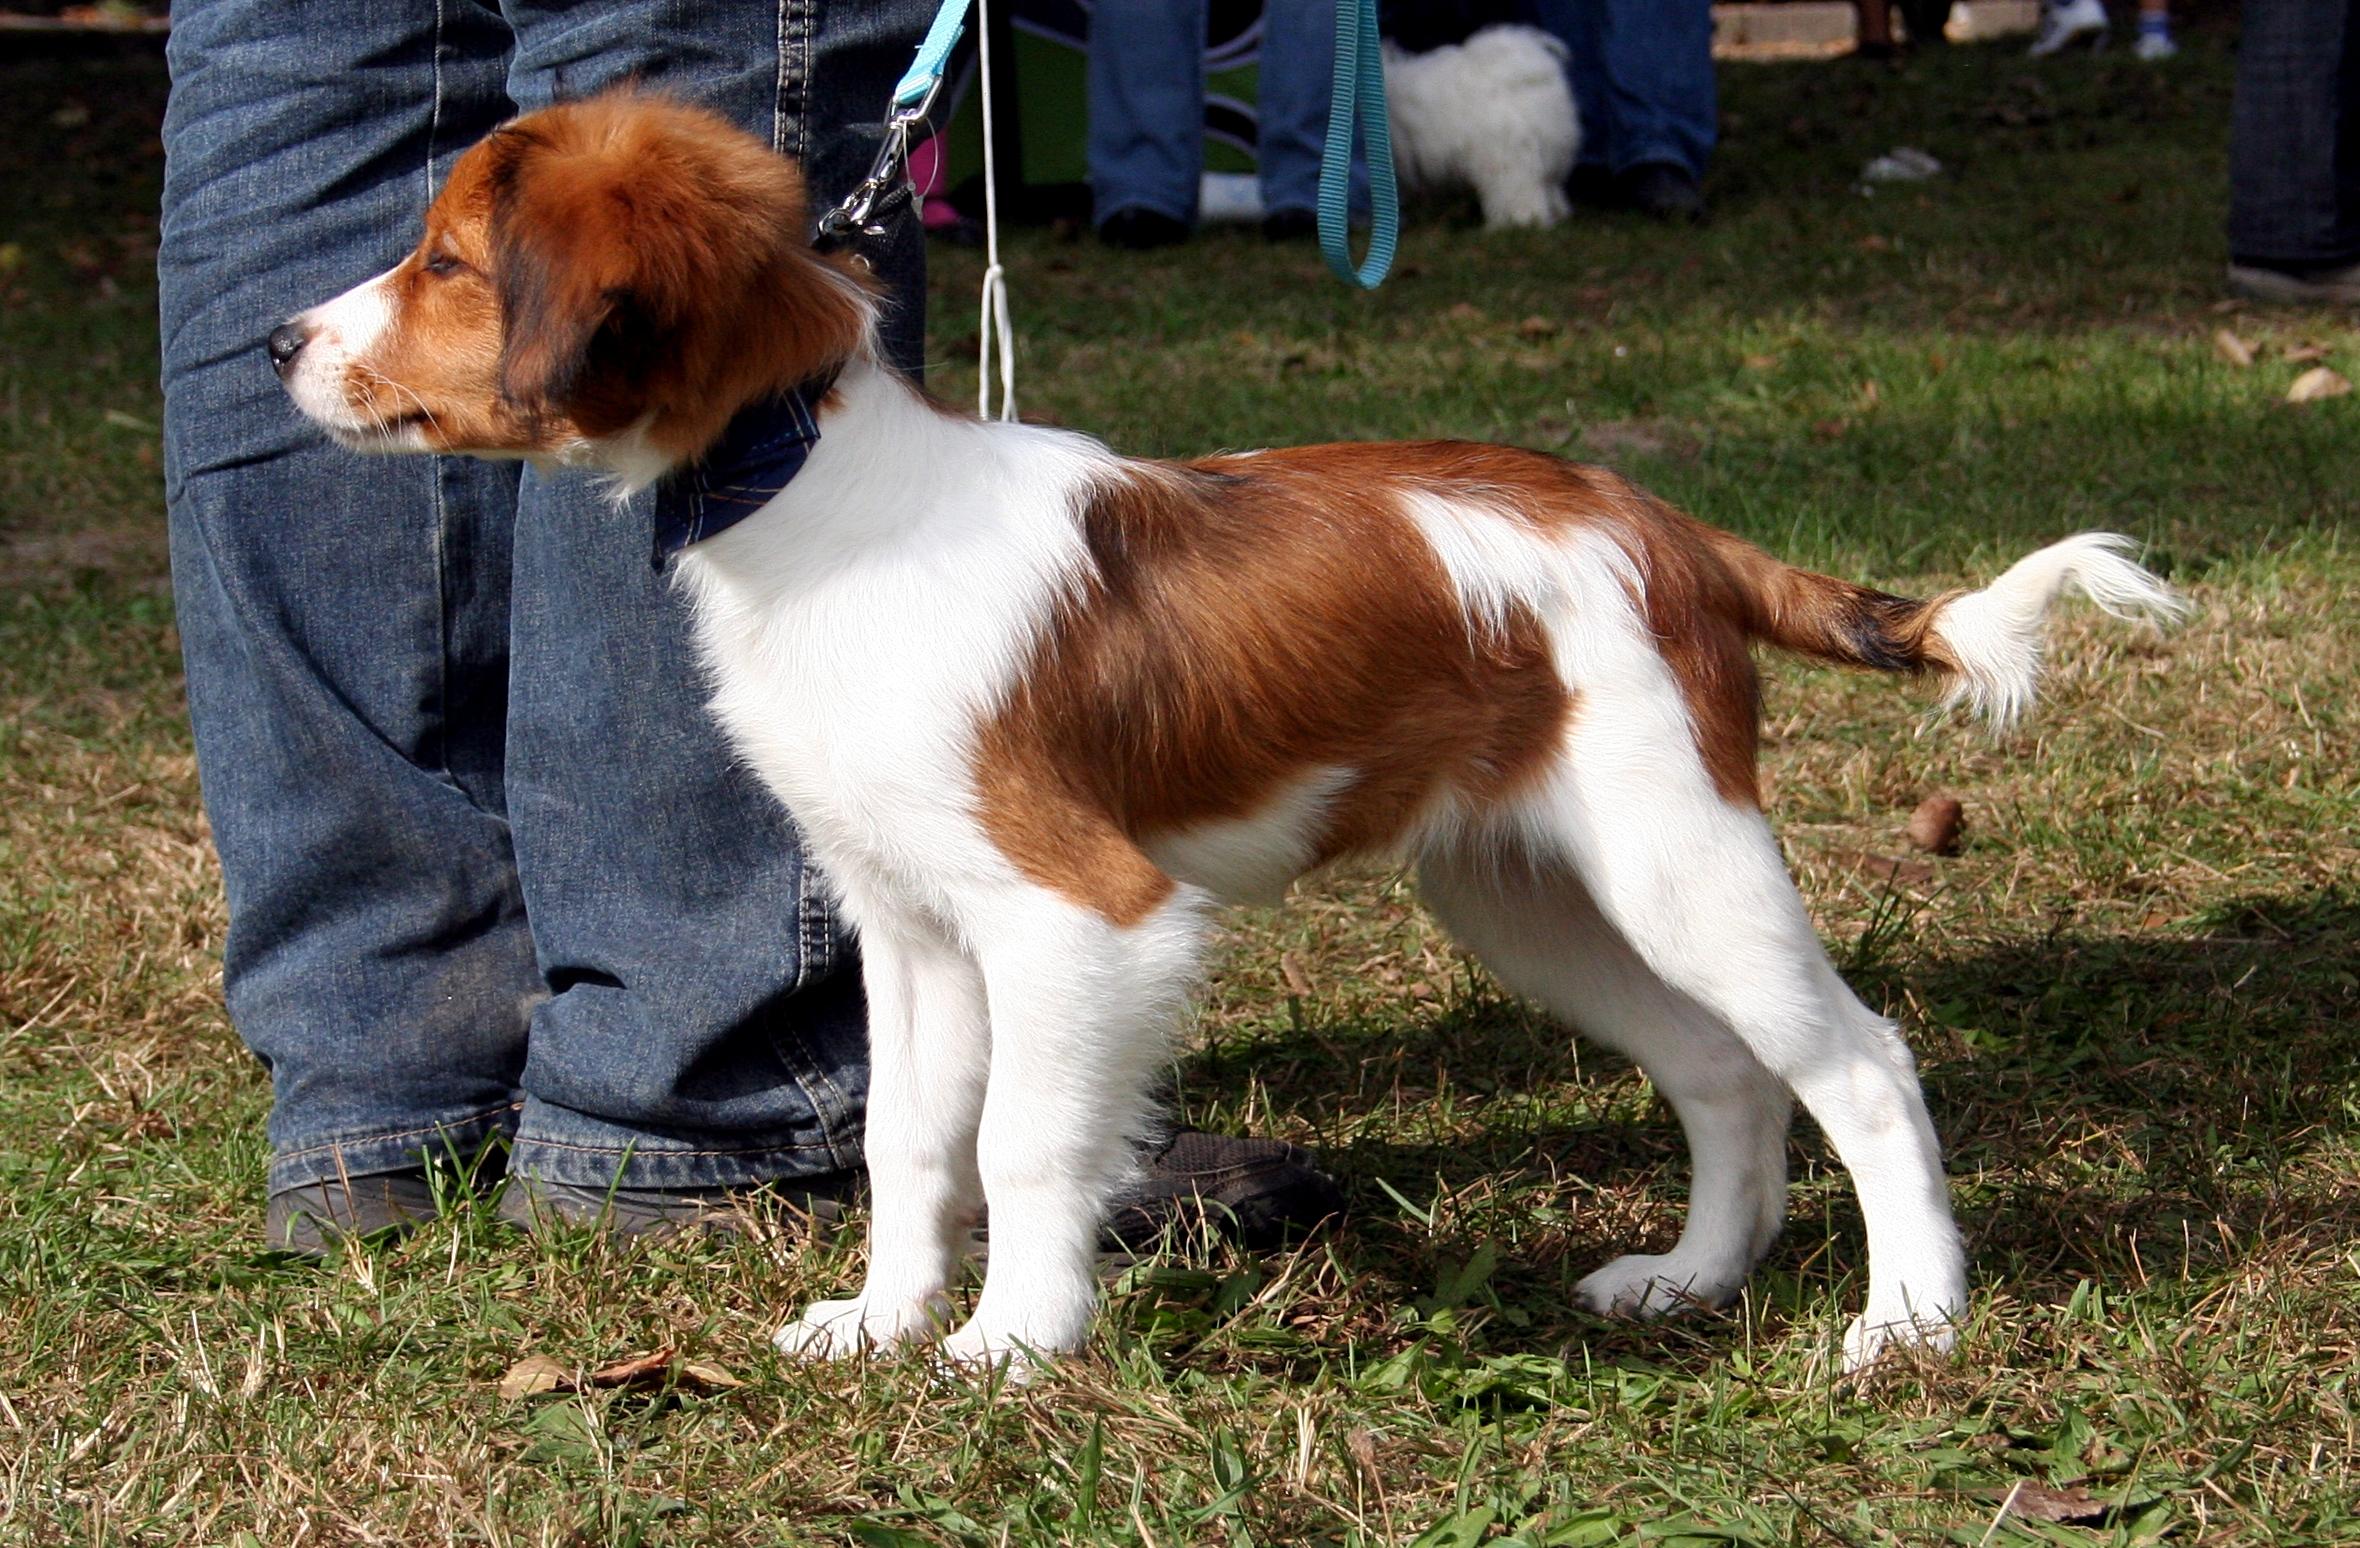 Kooikerhondje Dog: Kooikerhondje Kooikerhondje Puppies Breed